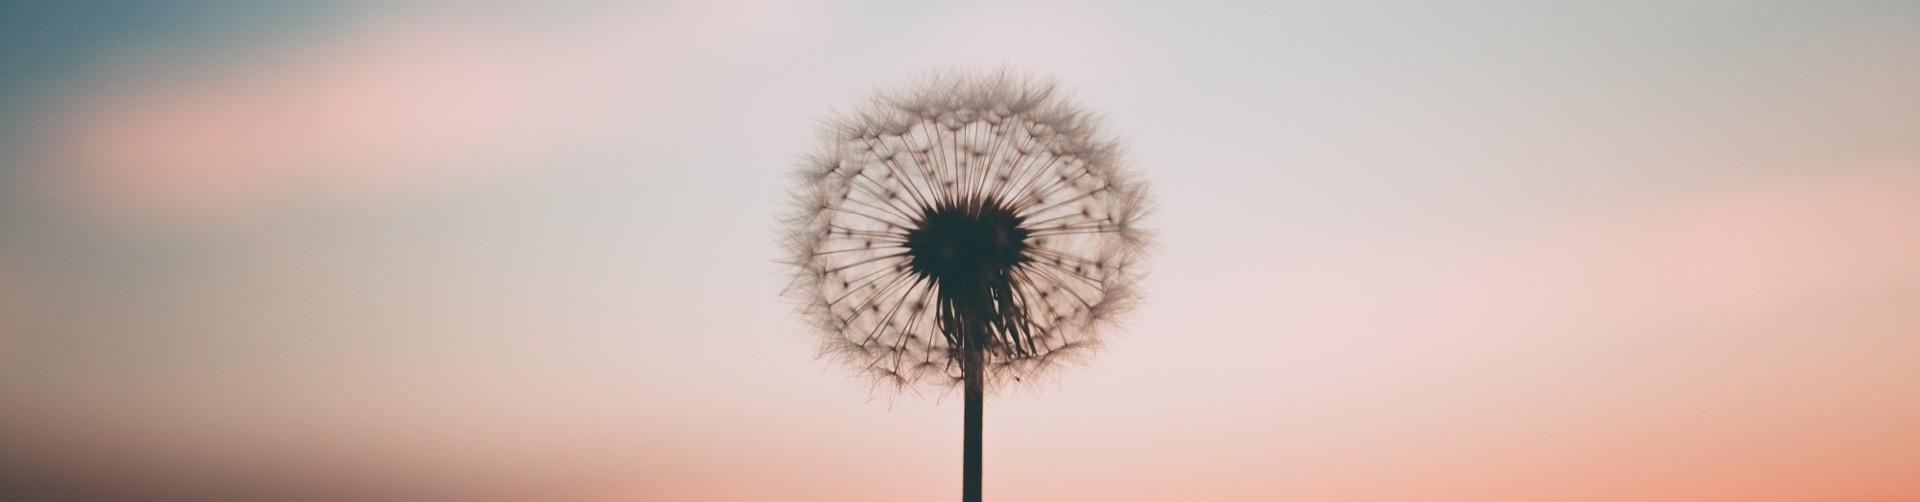 flor-atardecer-inself